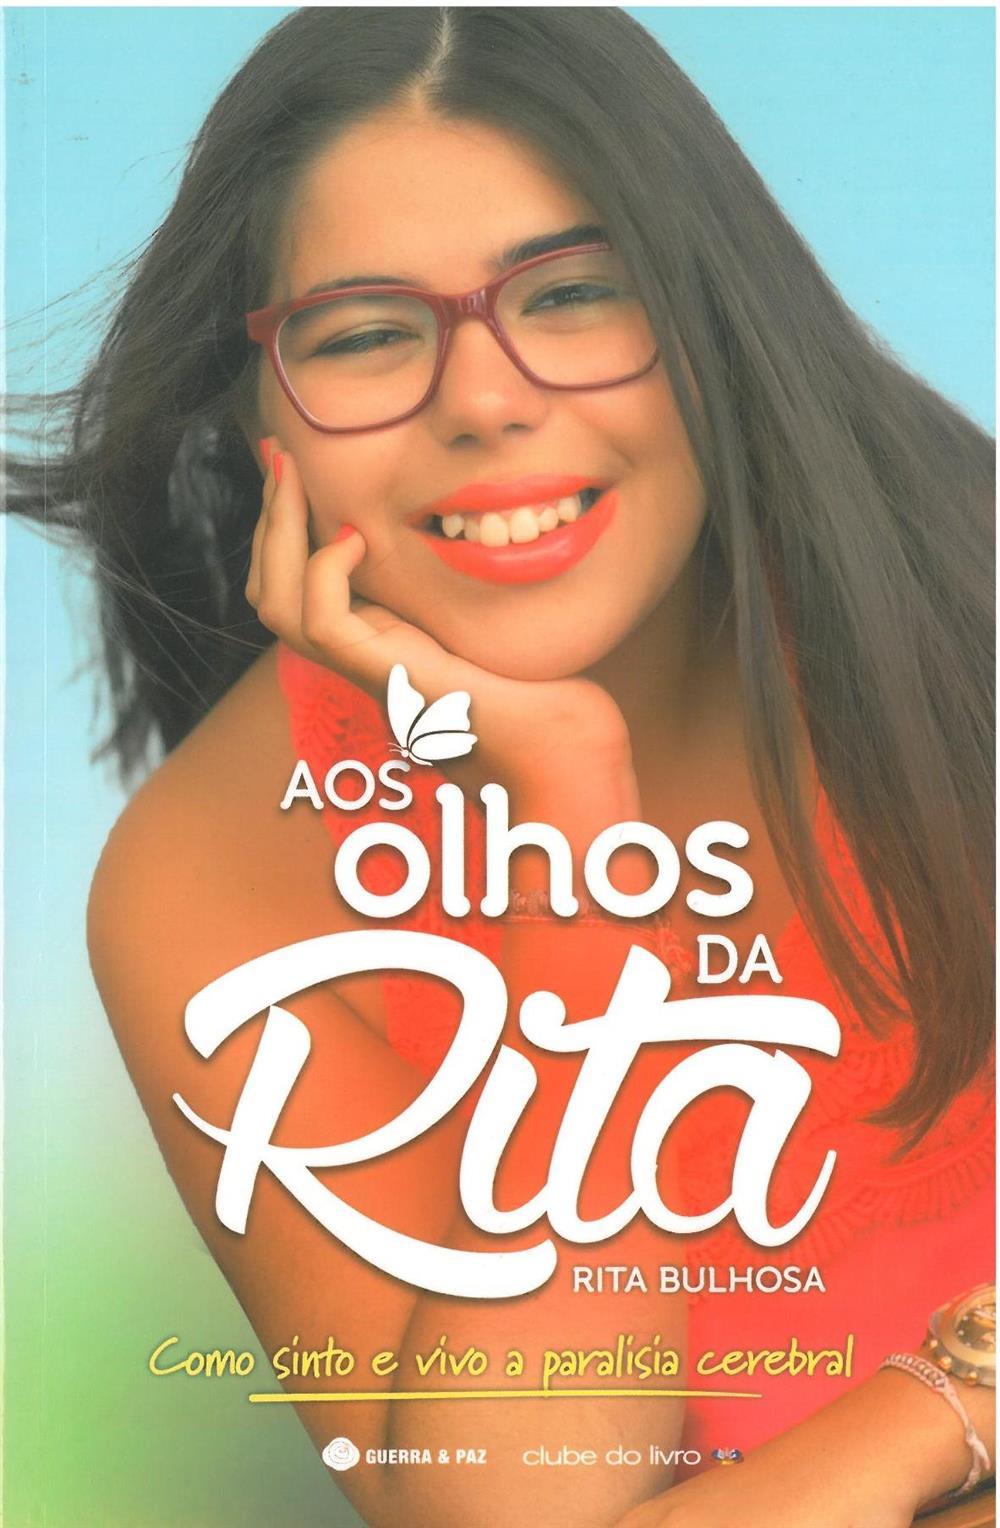 Aos olhos da Rita_.jpg